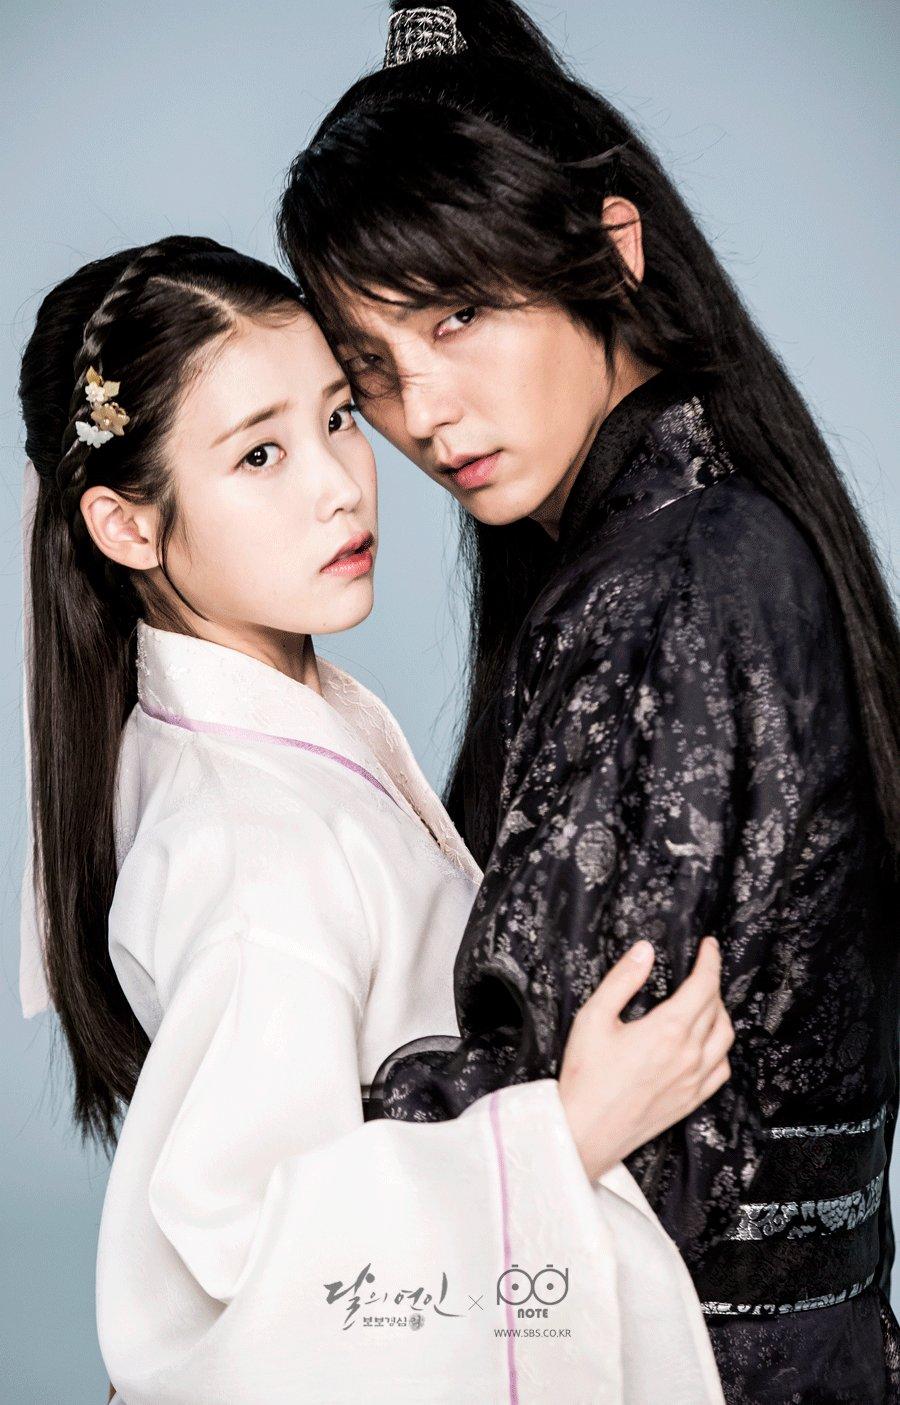 Moon Lovers: Scarlet Heart Ryeo Image #72609 - Asiachan ...